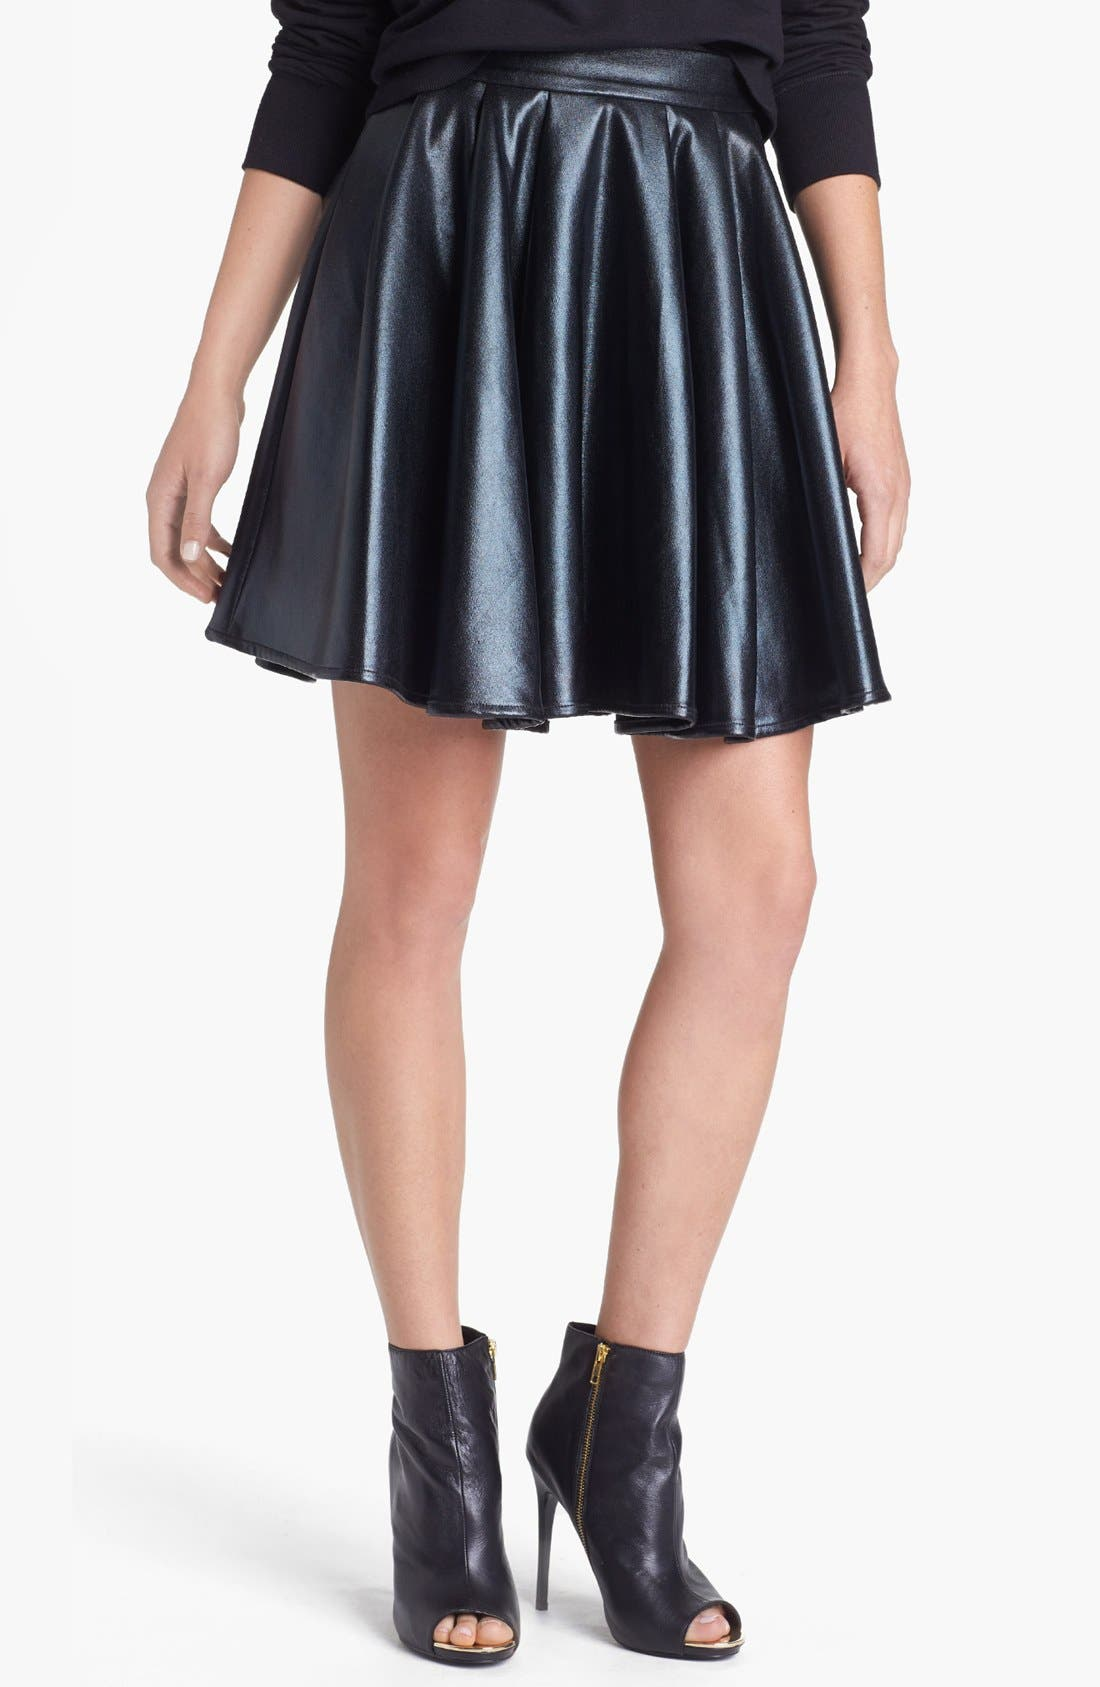 Alternate Image 1 Selected - ELEVENPARIS 'Timac' Faux Leather Skater Skirt